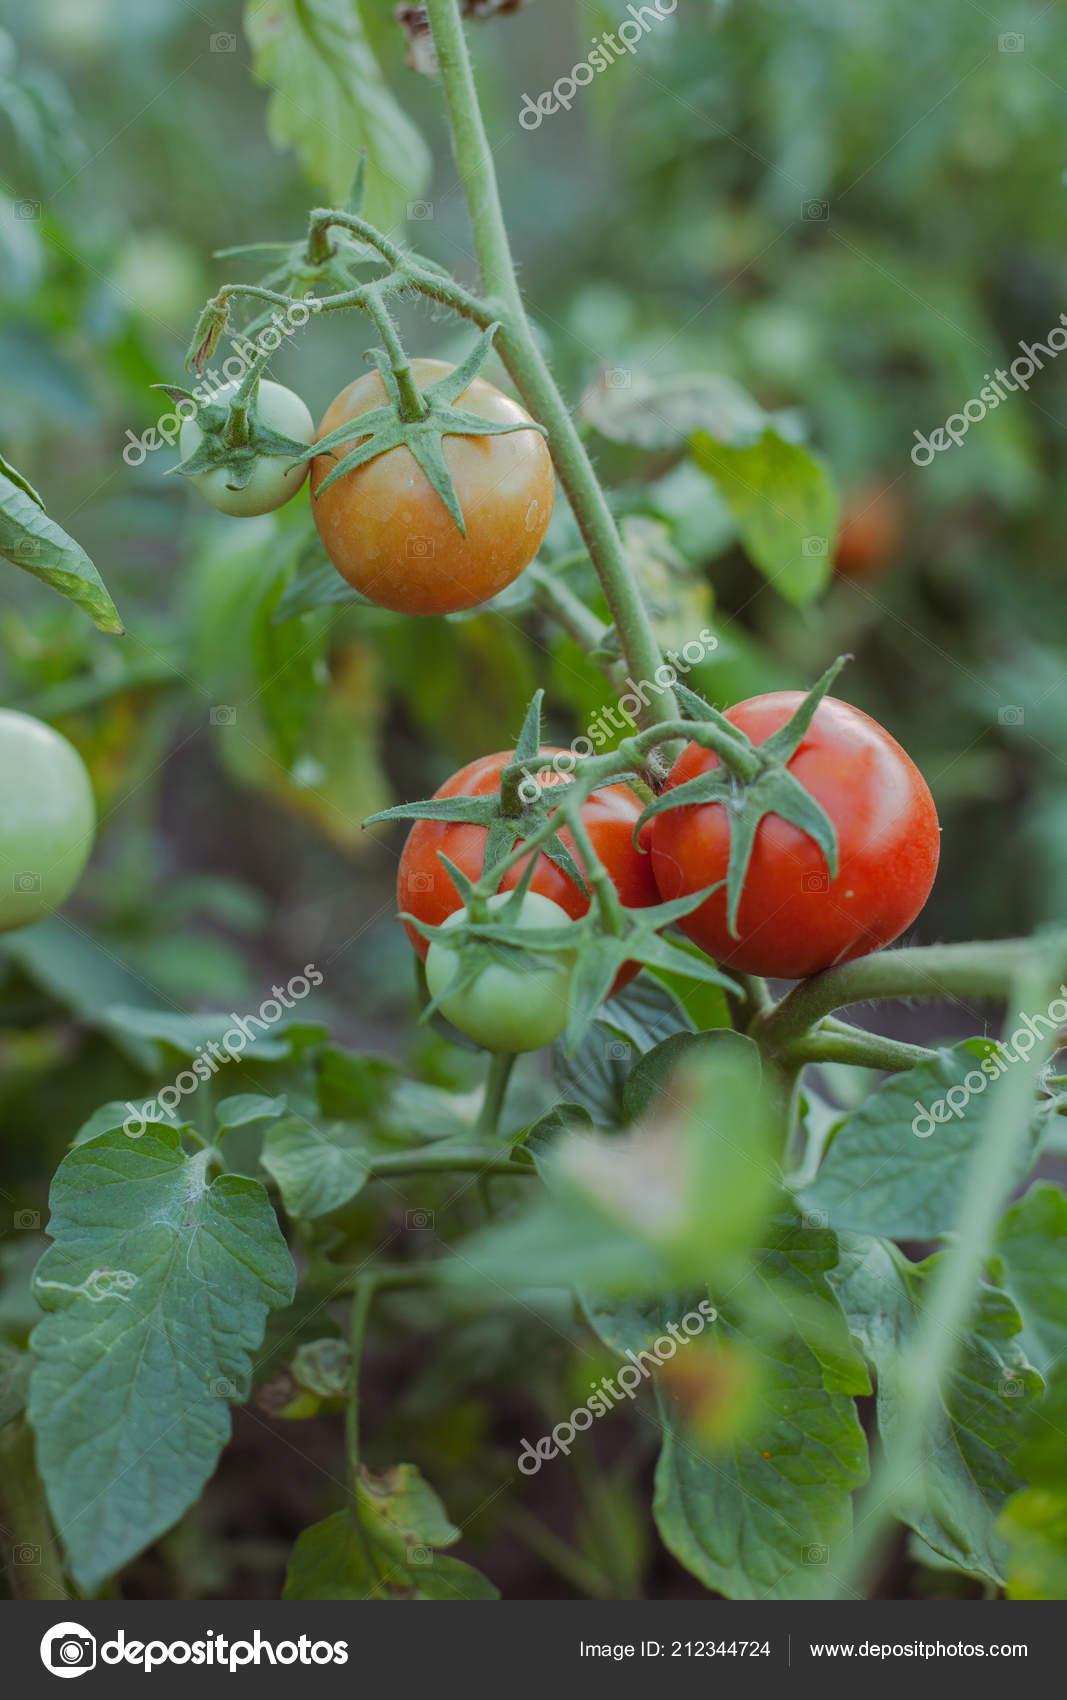 Growing Tomatoes Garden Stock Photo C Merry Vk 212344724